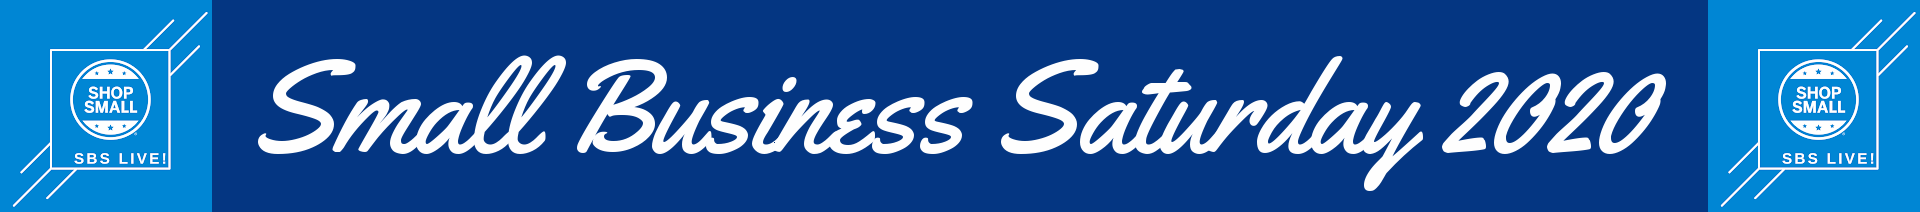 SBS-2020-Full-Width-Banner-1920-x-212-.png